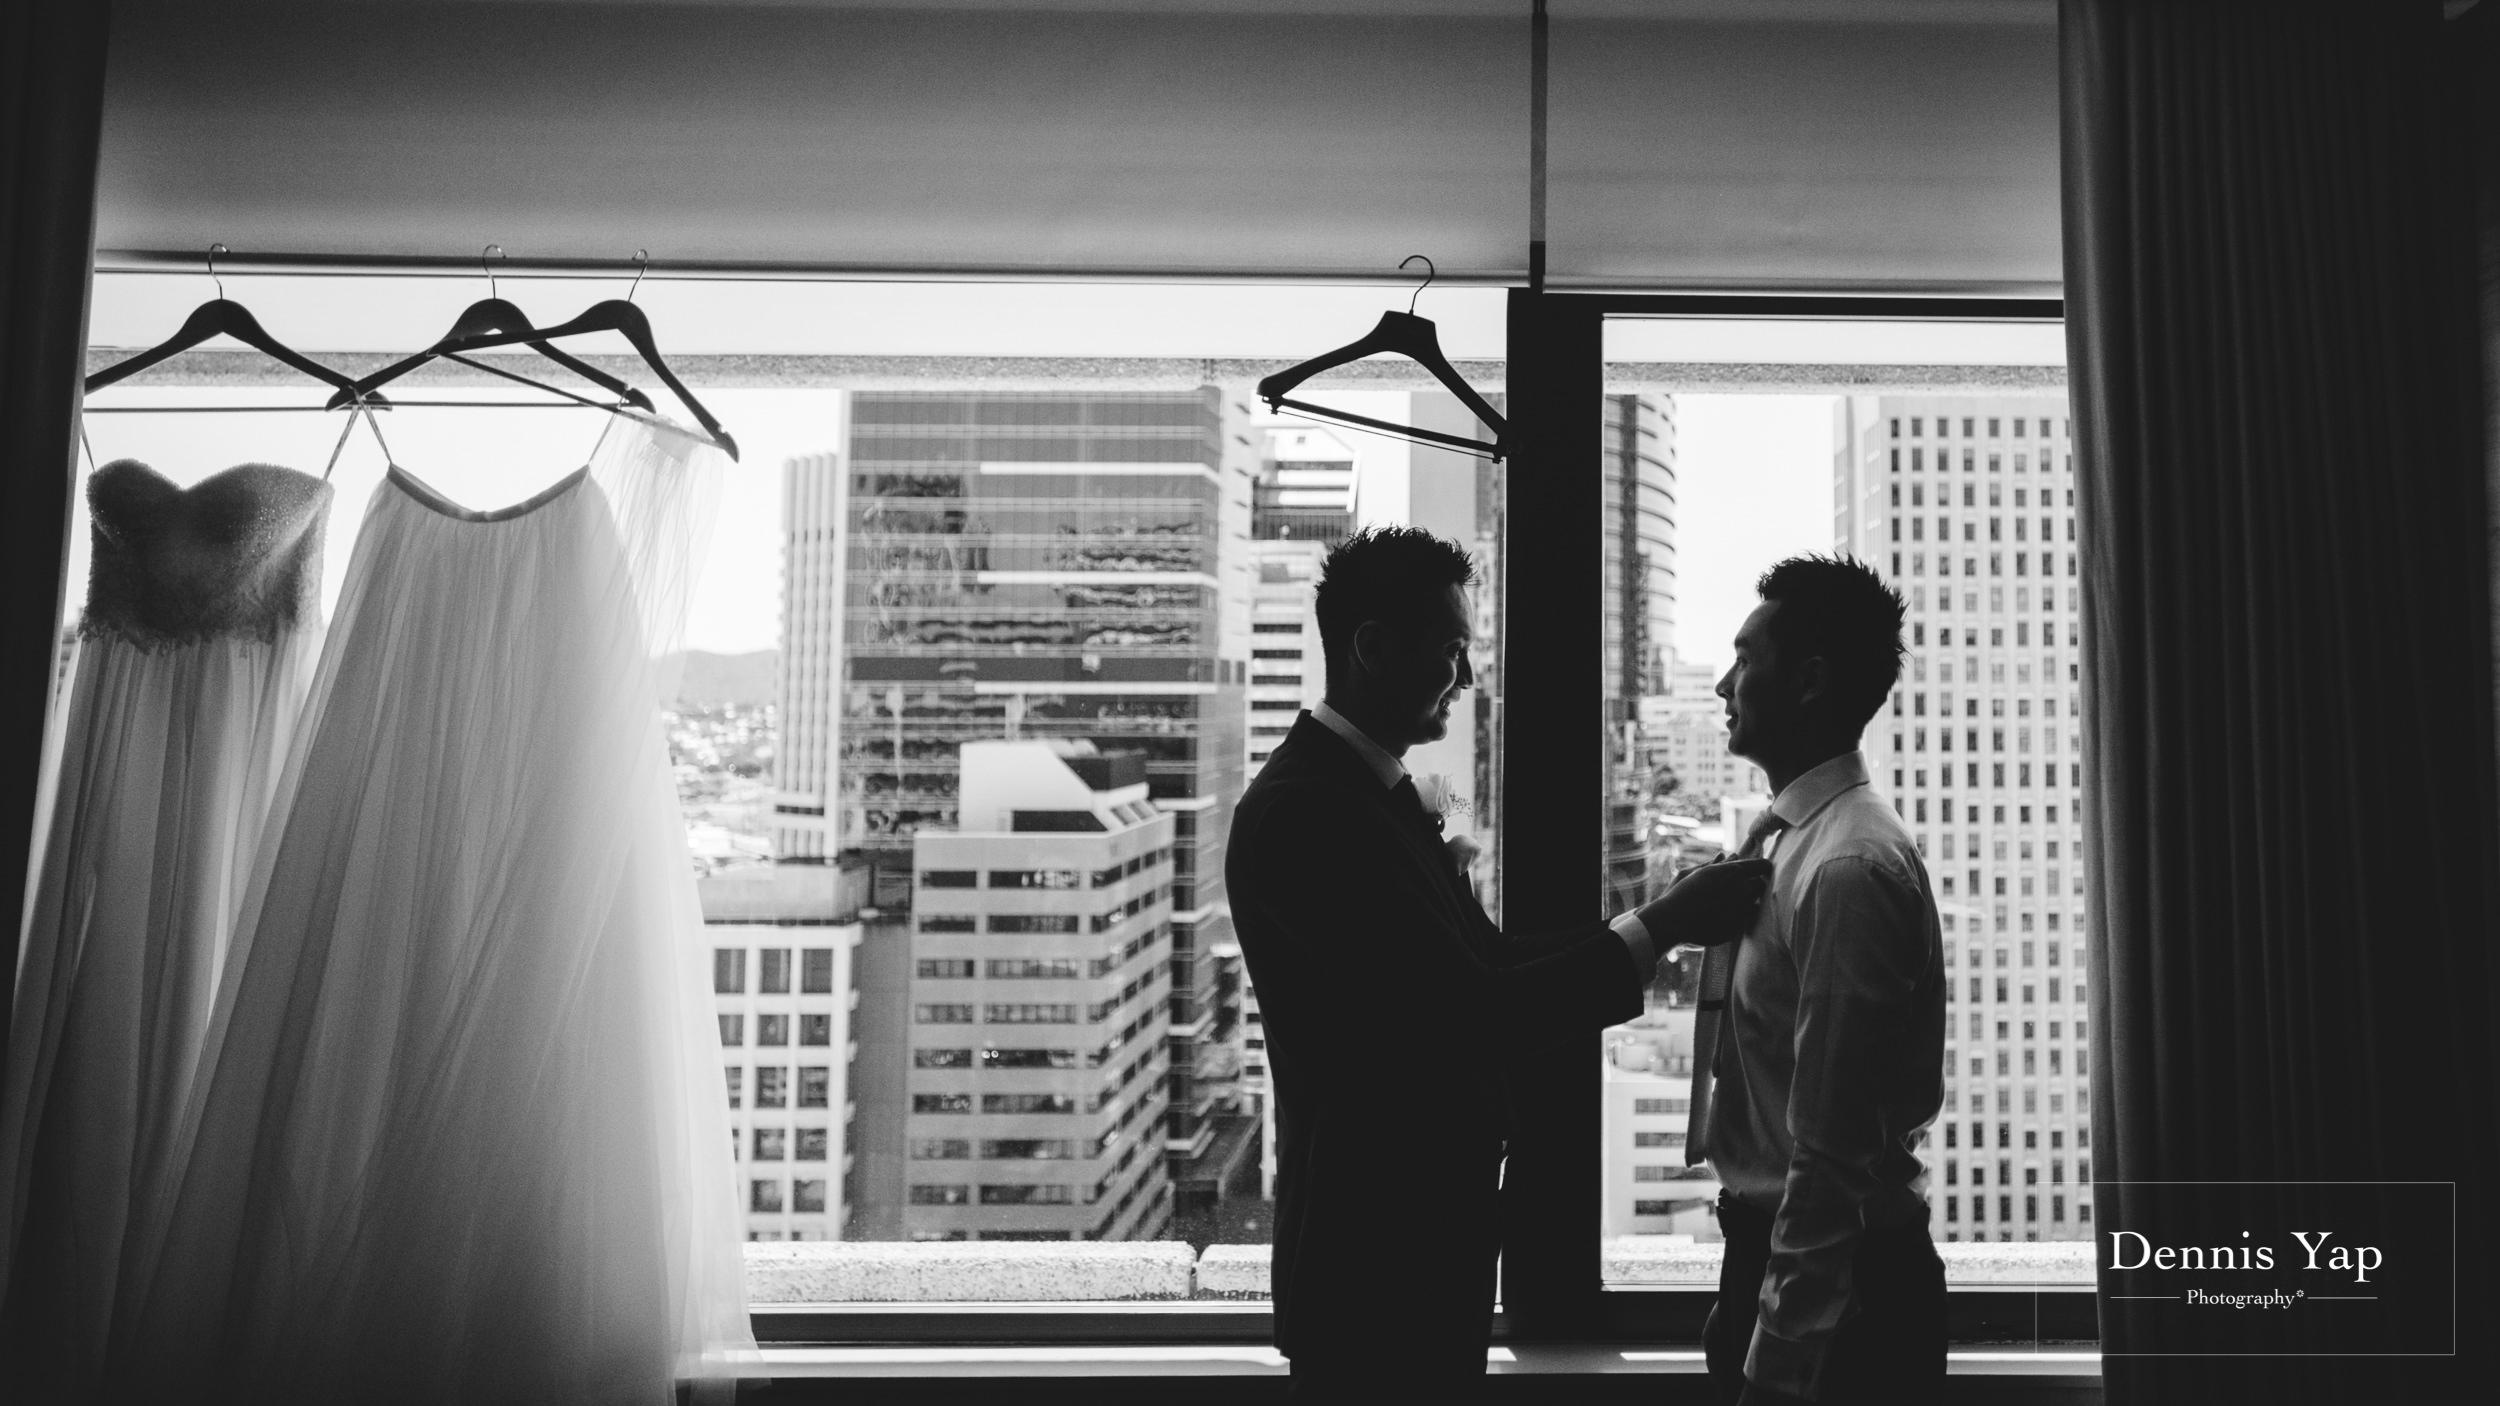 thang veng vietnamese wedding brisbane dennis yap photography malaysia wedding photographer-11.jpg